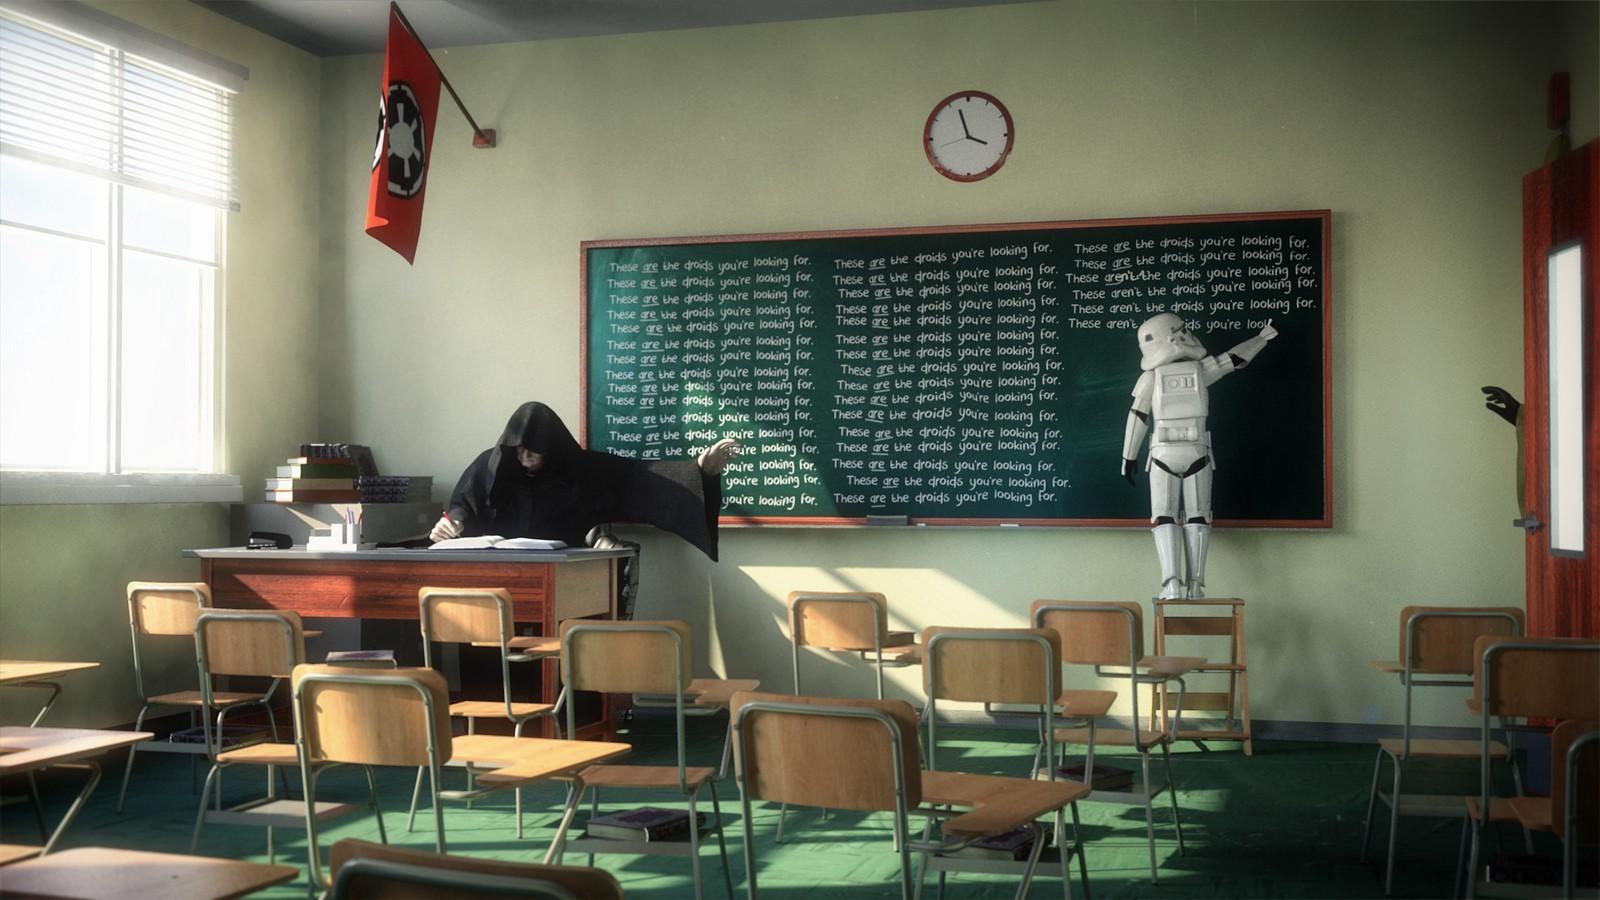 General 1600x900 Star Wars Emperor Palpatine stormtrooper school classroom cosplay Star Wars Humor chalkboard Star Wars Villains clocks chair indoors Sith